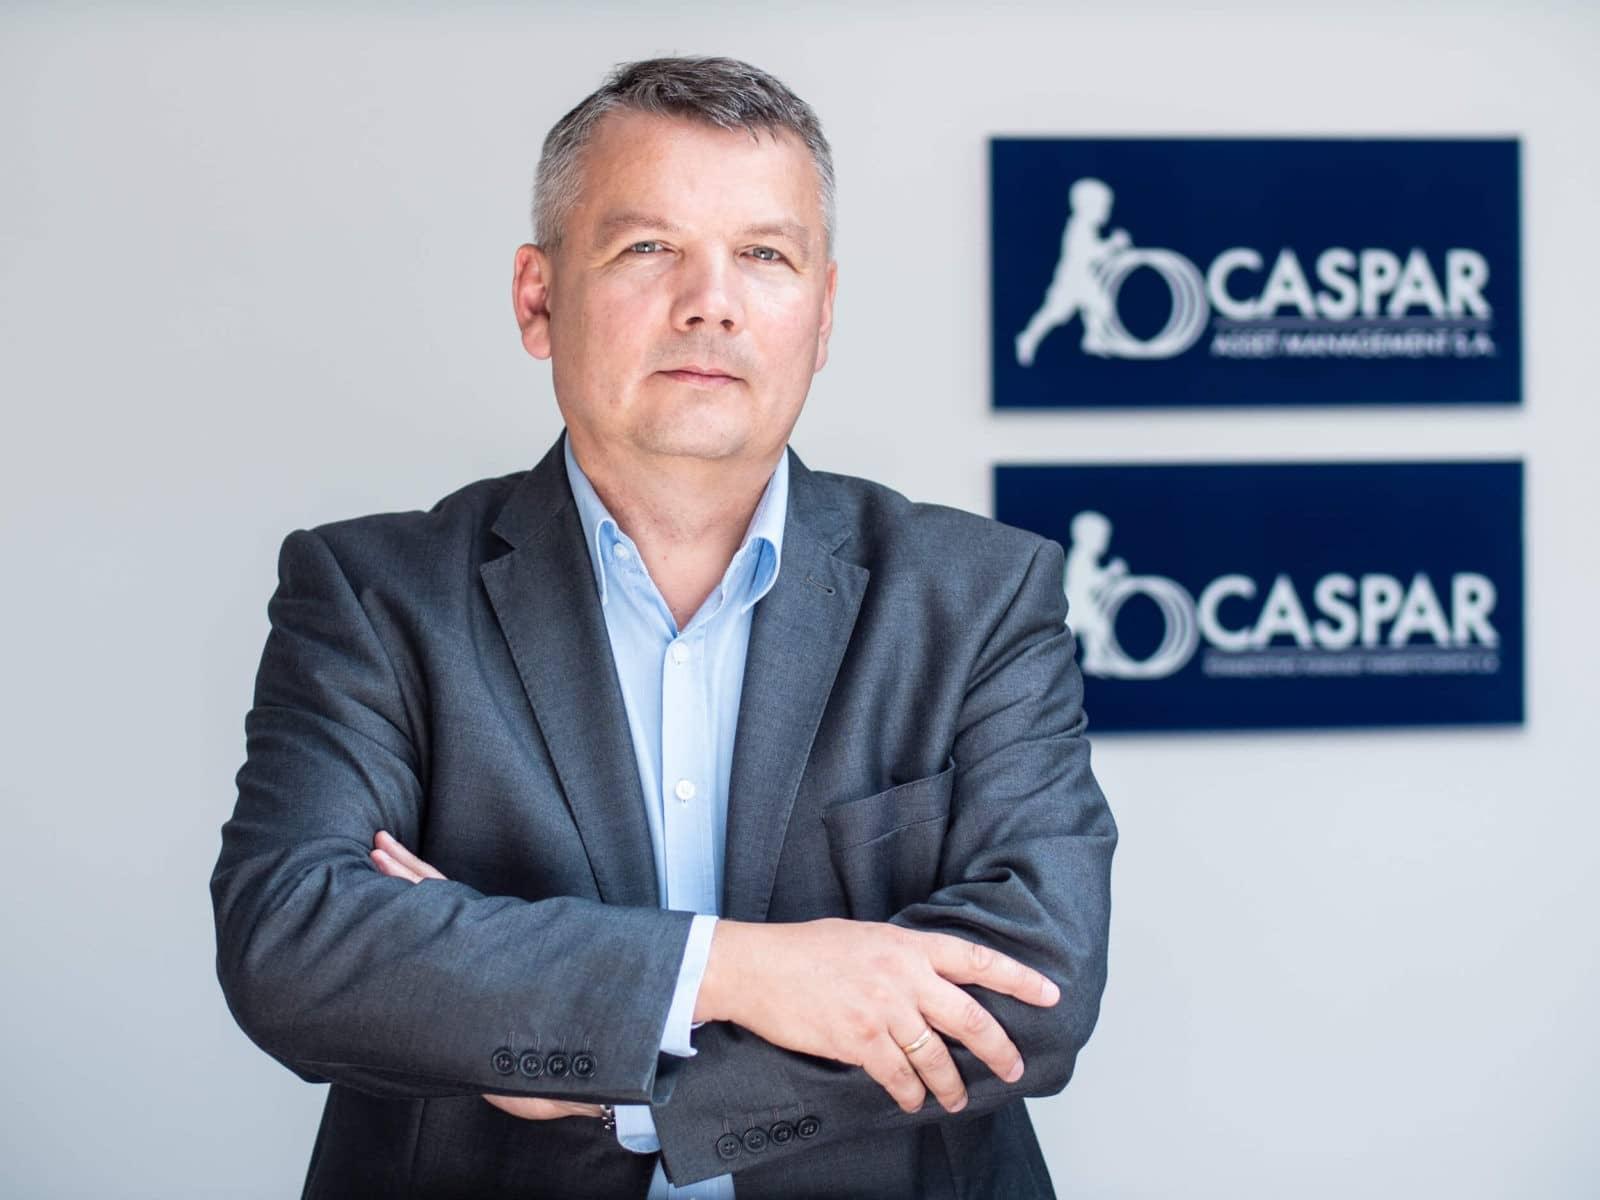 Piotr Sawczuk | Caspar